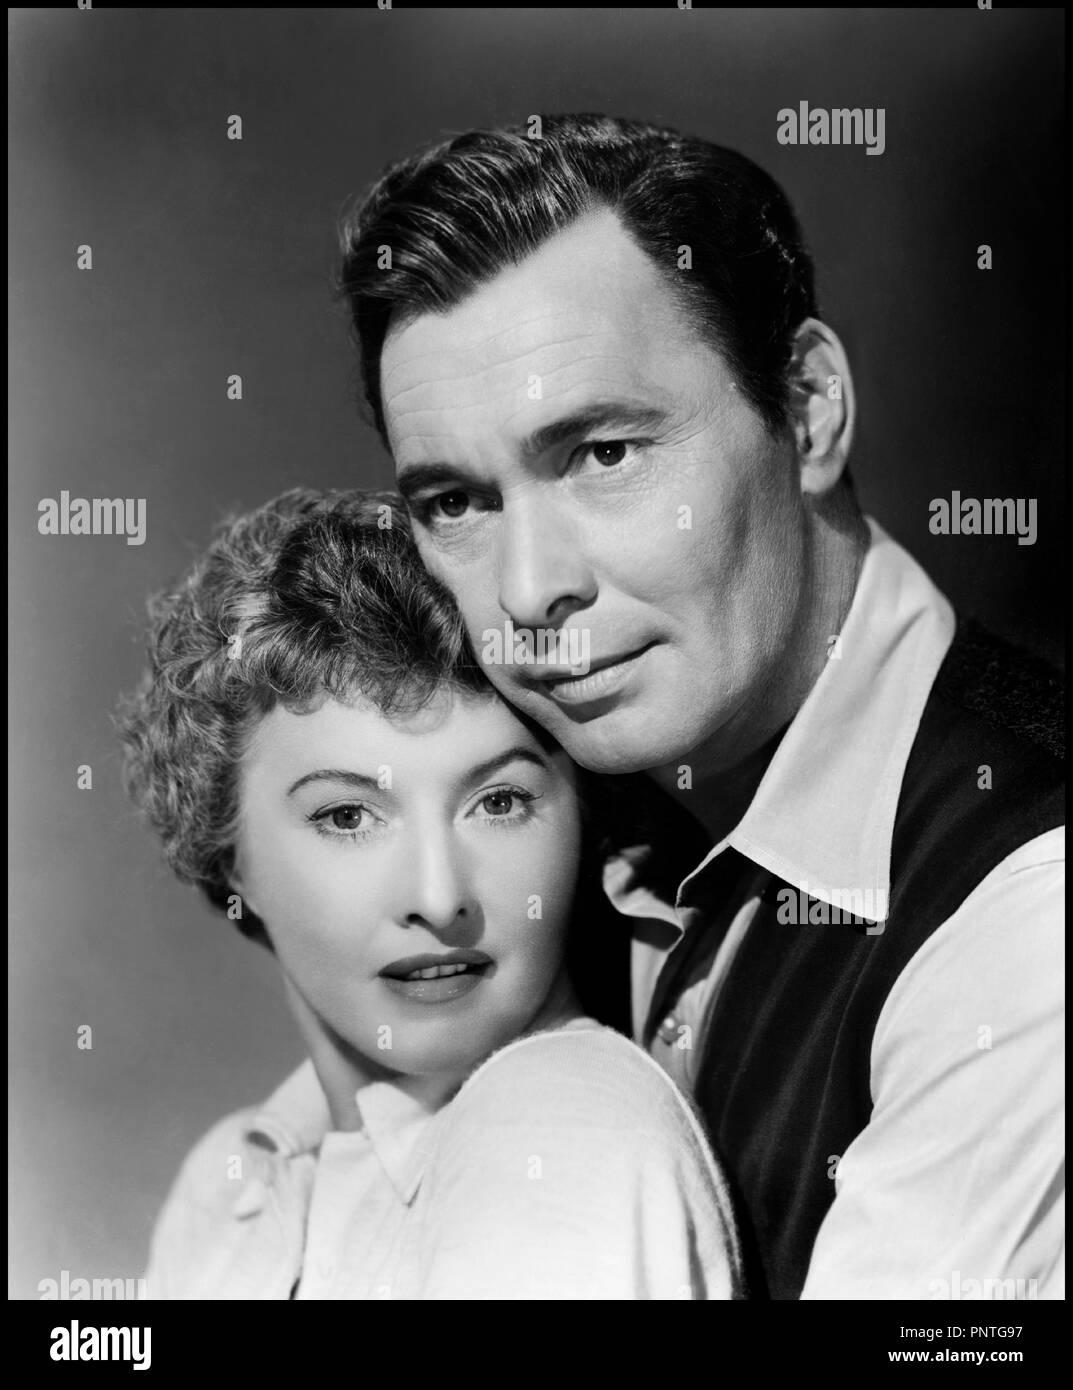 Prod DB © Loew's Inc. - Metro-Goldwyn-Mayer / DR LA PLAGE DESERTE (JEOPARDY) de John Sturges 1953 USA avec Barbara Stanwyck et Barry Sullivan portrait, couple, pose, film noir code MGM: 1594 - Stock Image